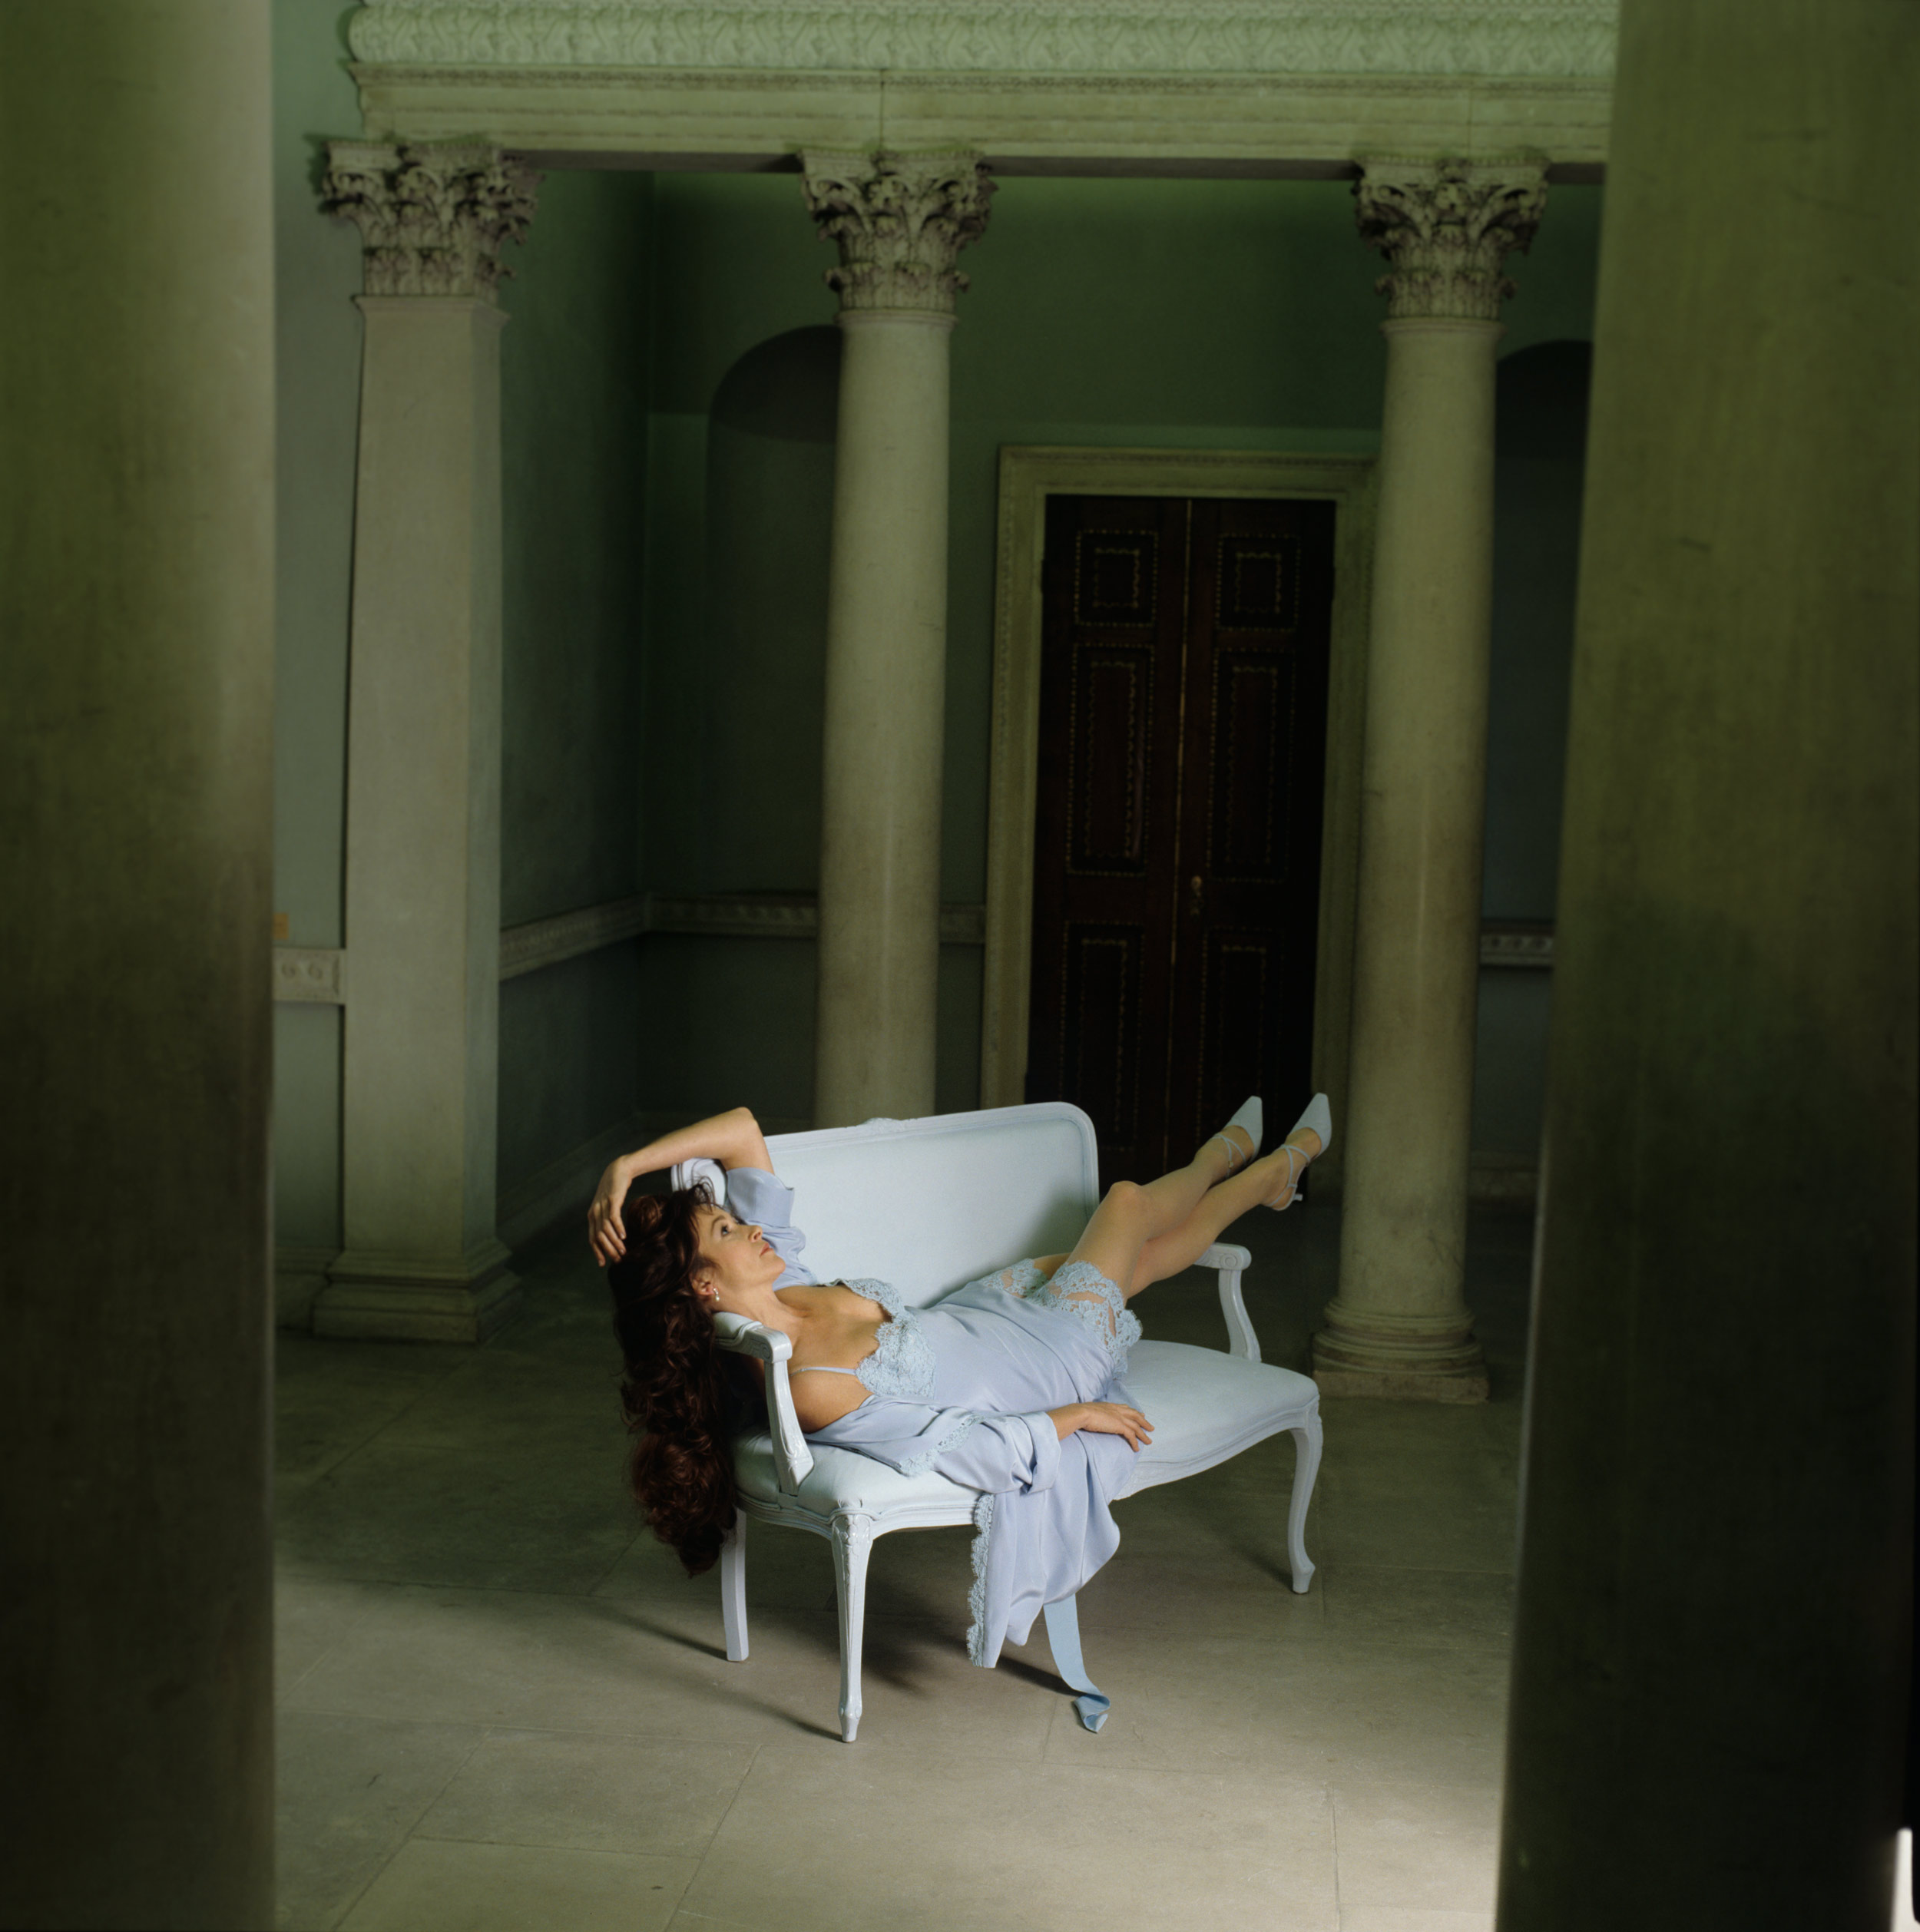 Cherie Lunghi (OK Magazine)